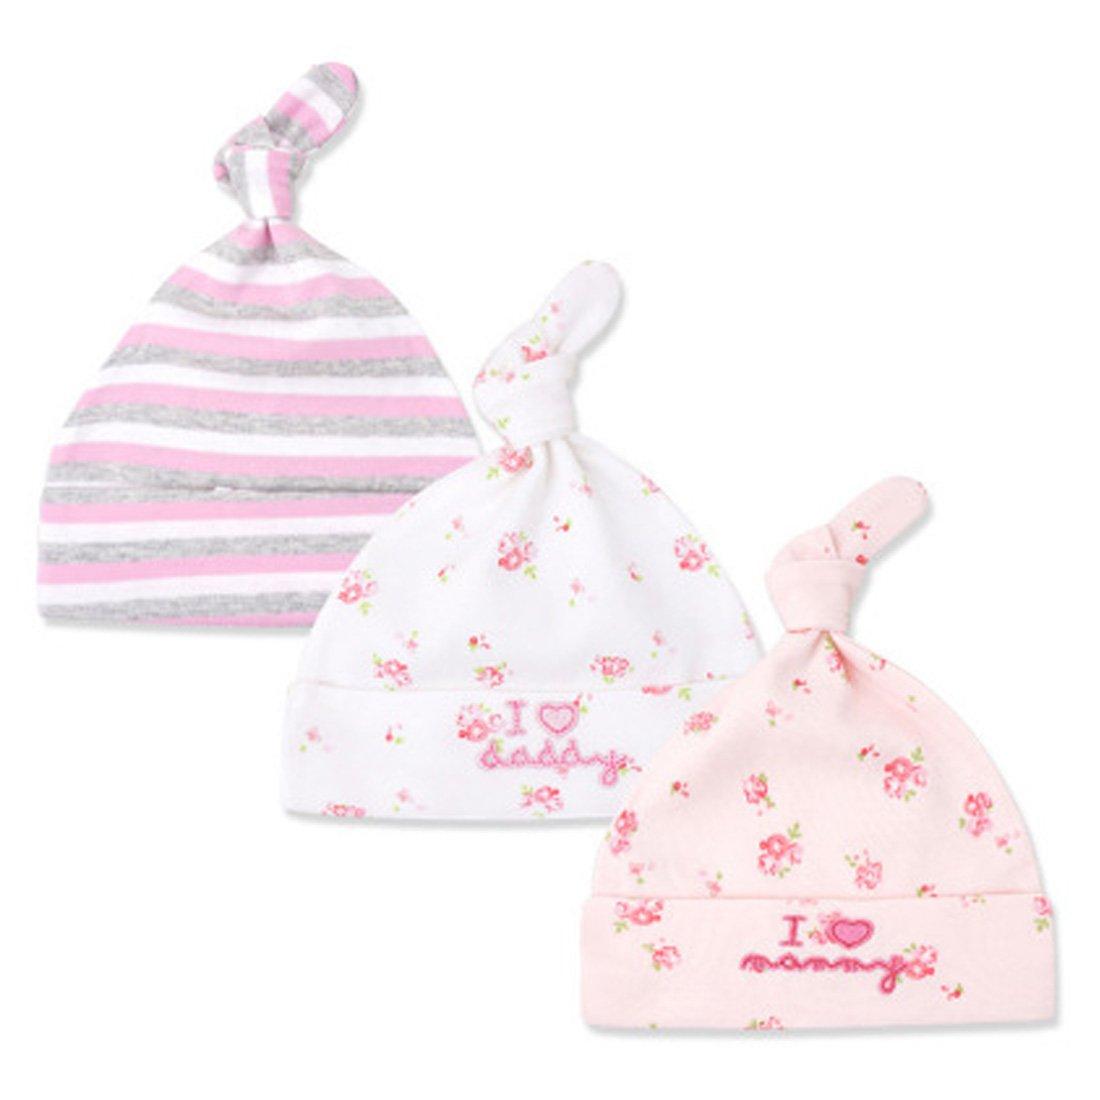 CuteOn 3 Pack Baby Beanie Knot Hat Newborn Boys Girls Cotton Adjustable Cap for Baby 0-6 Months MZ001-01